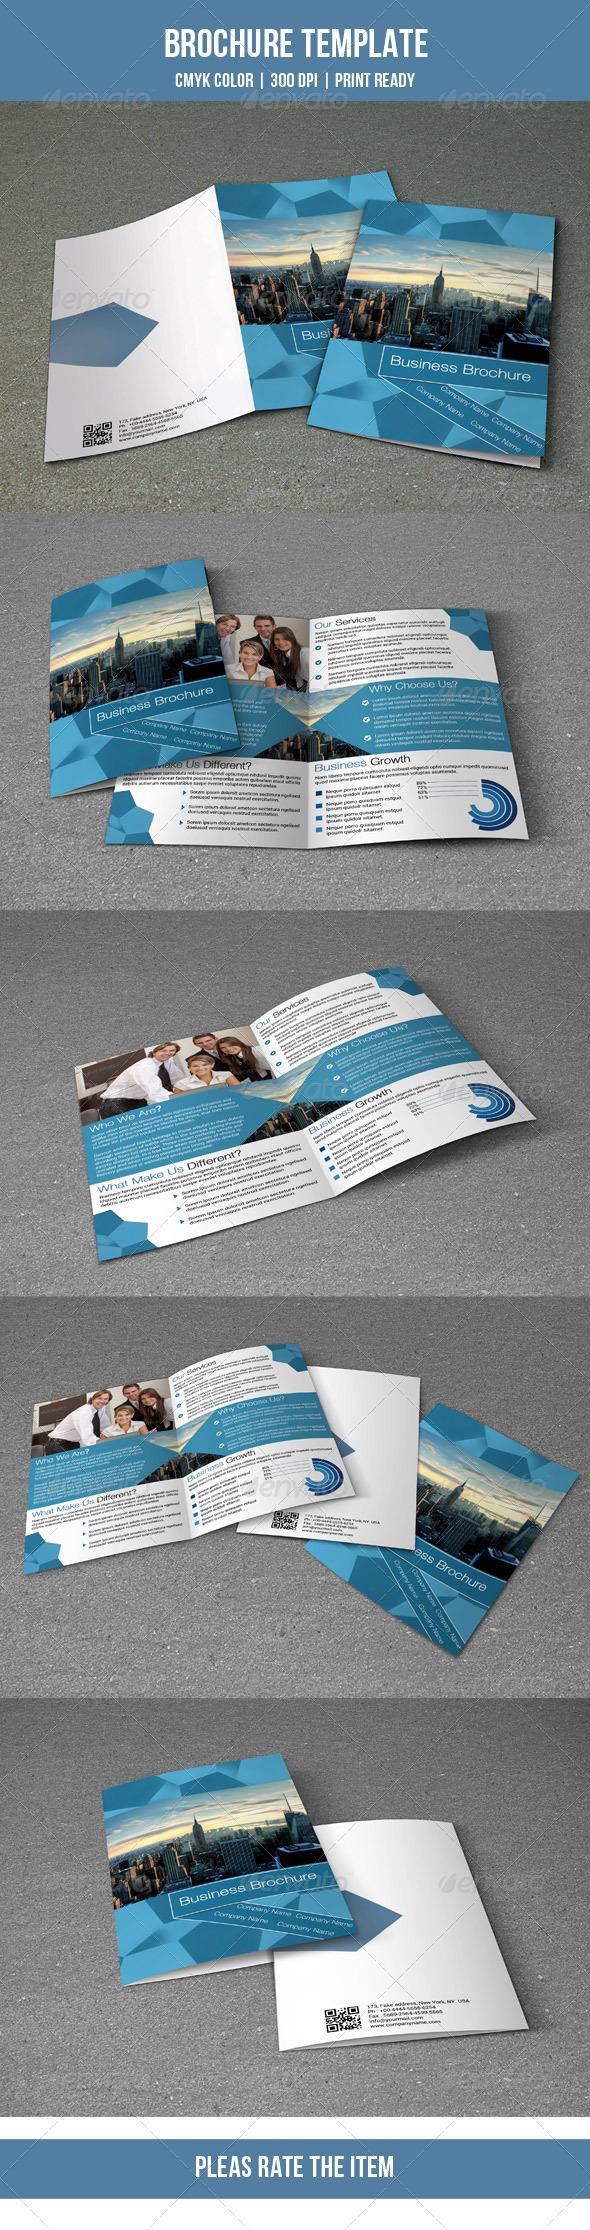 GraphicRiver Corporate Brochure Template-V73 8123582